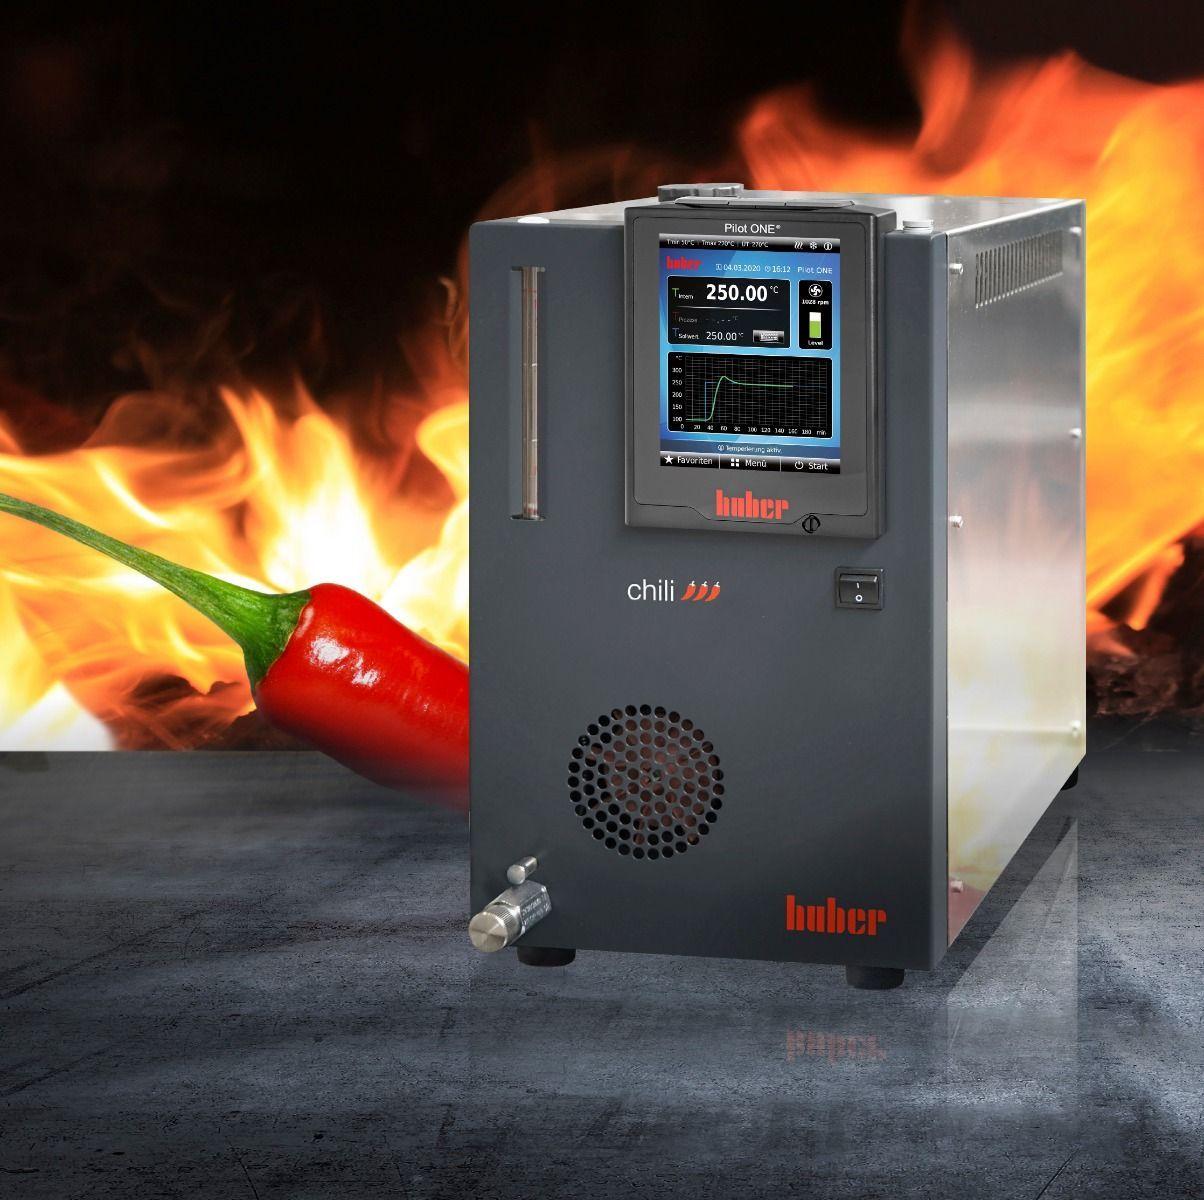 Chili Heating Circulation Thermostat